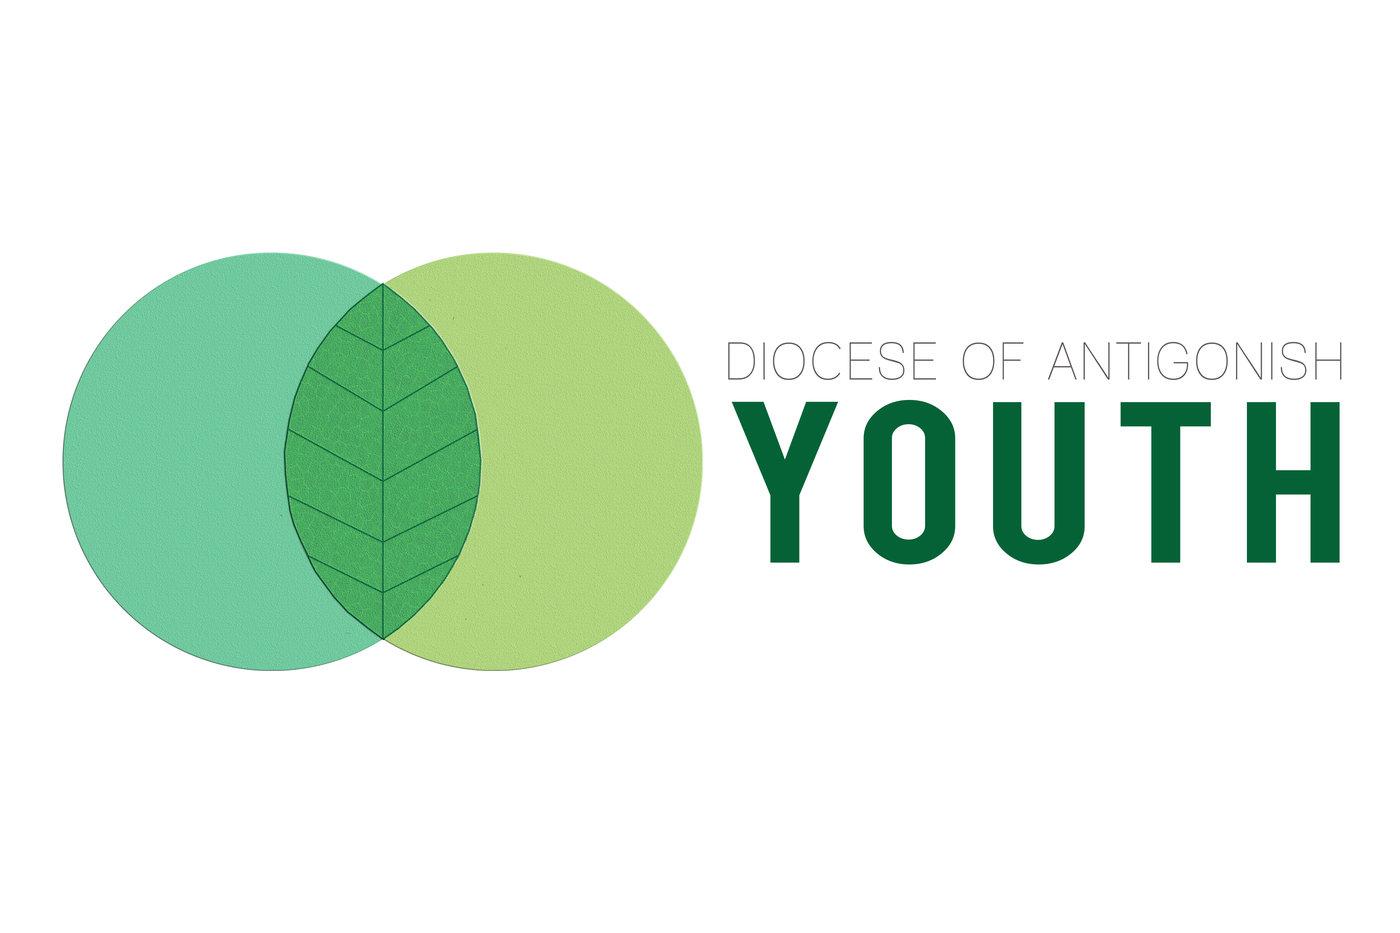 Diocese of antigonish